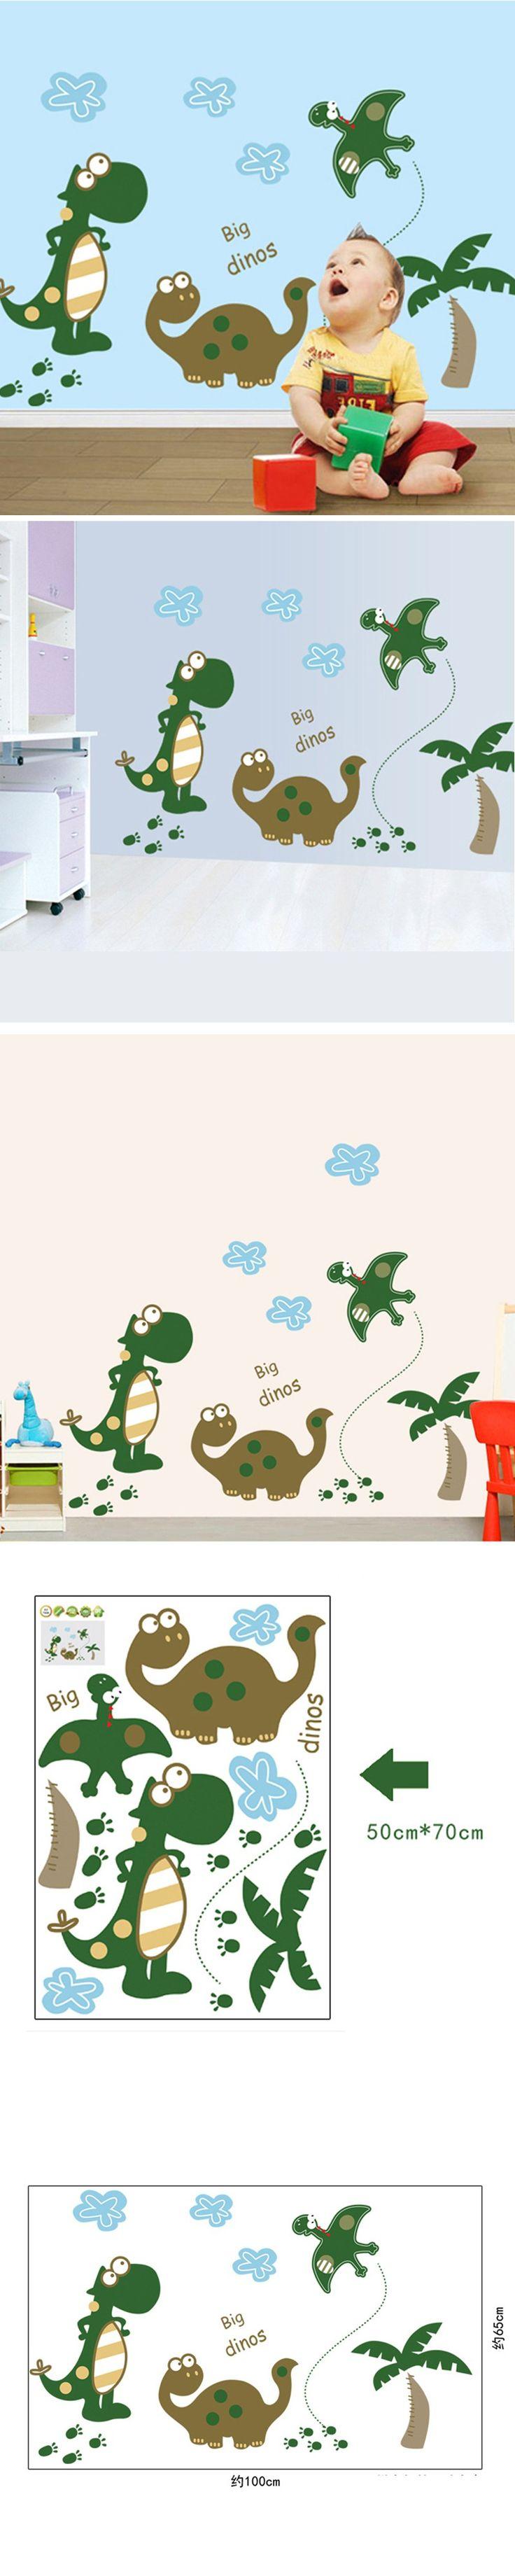 Fashion Cute New Cartoon Dinosaur Wall Stickers Kids Room Decorative Children Removable PVC Home Decor Wallpapers E007 $7.06